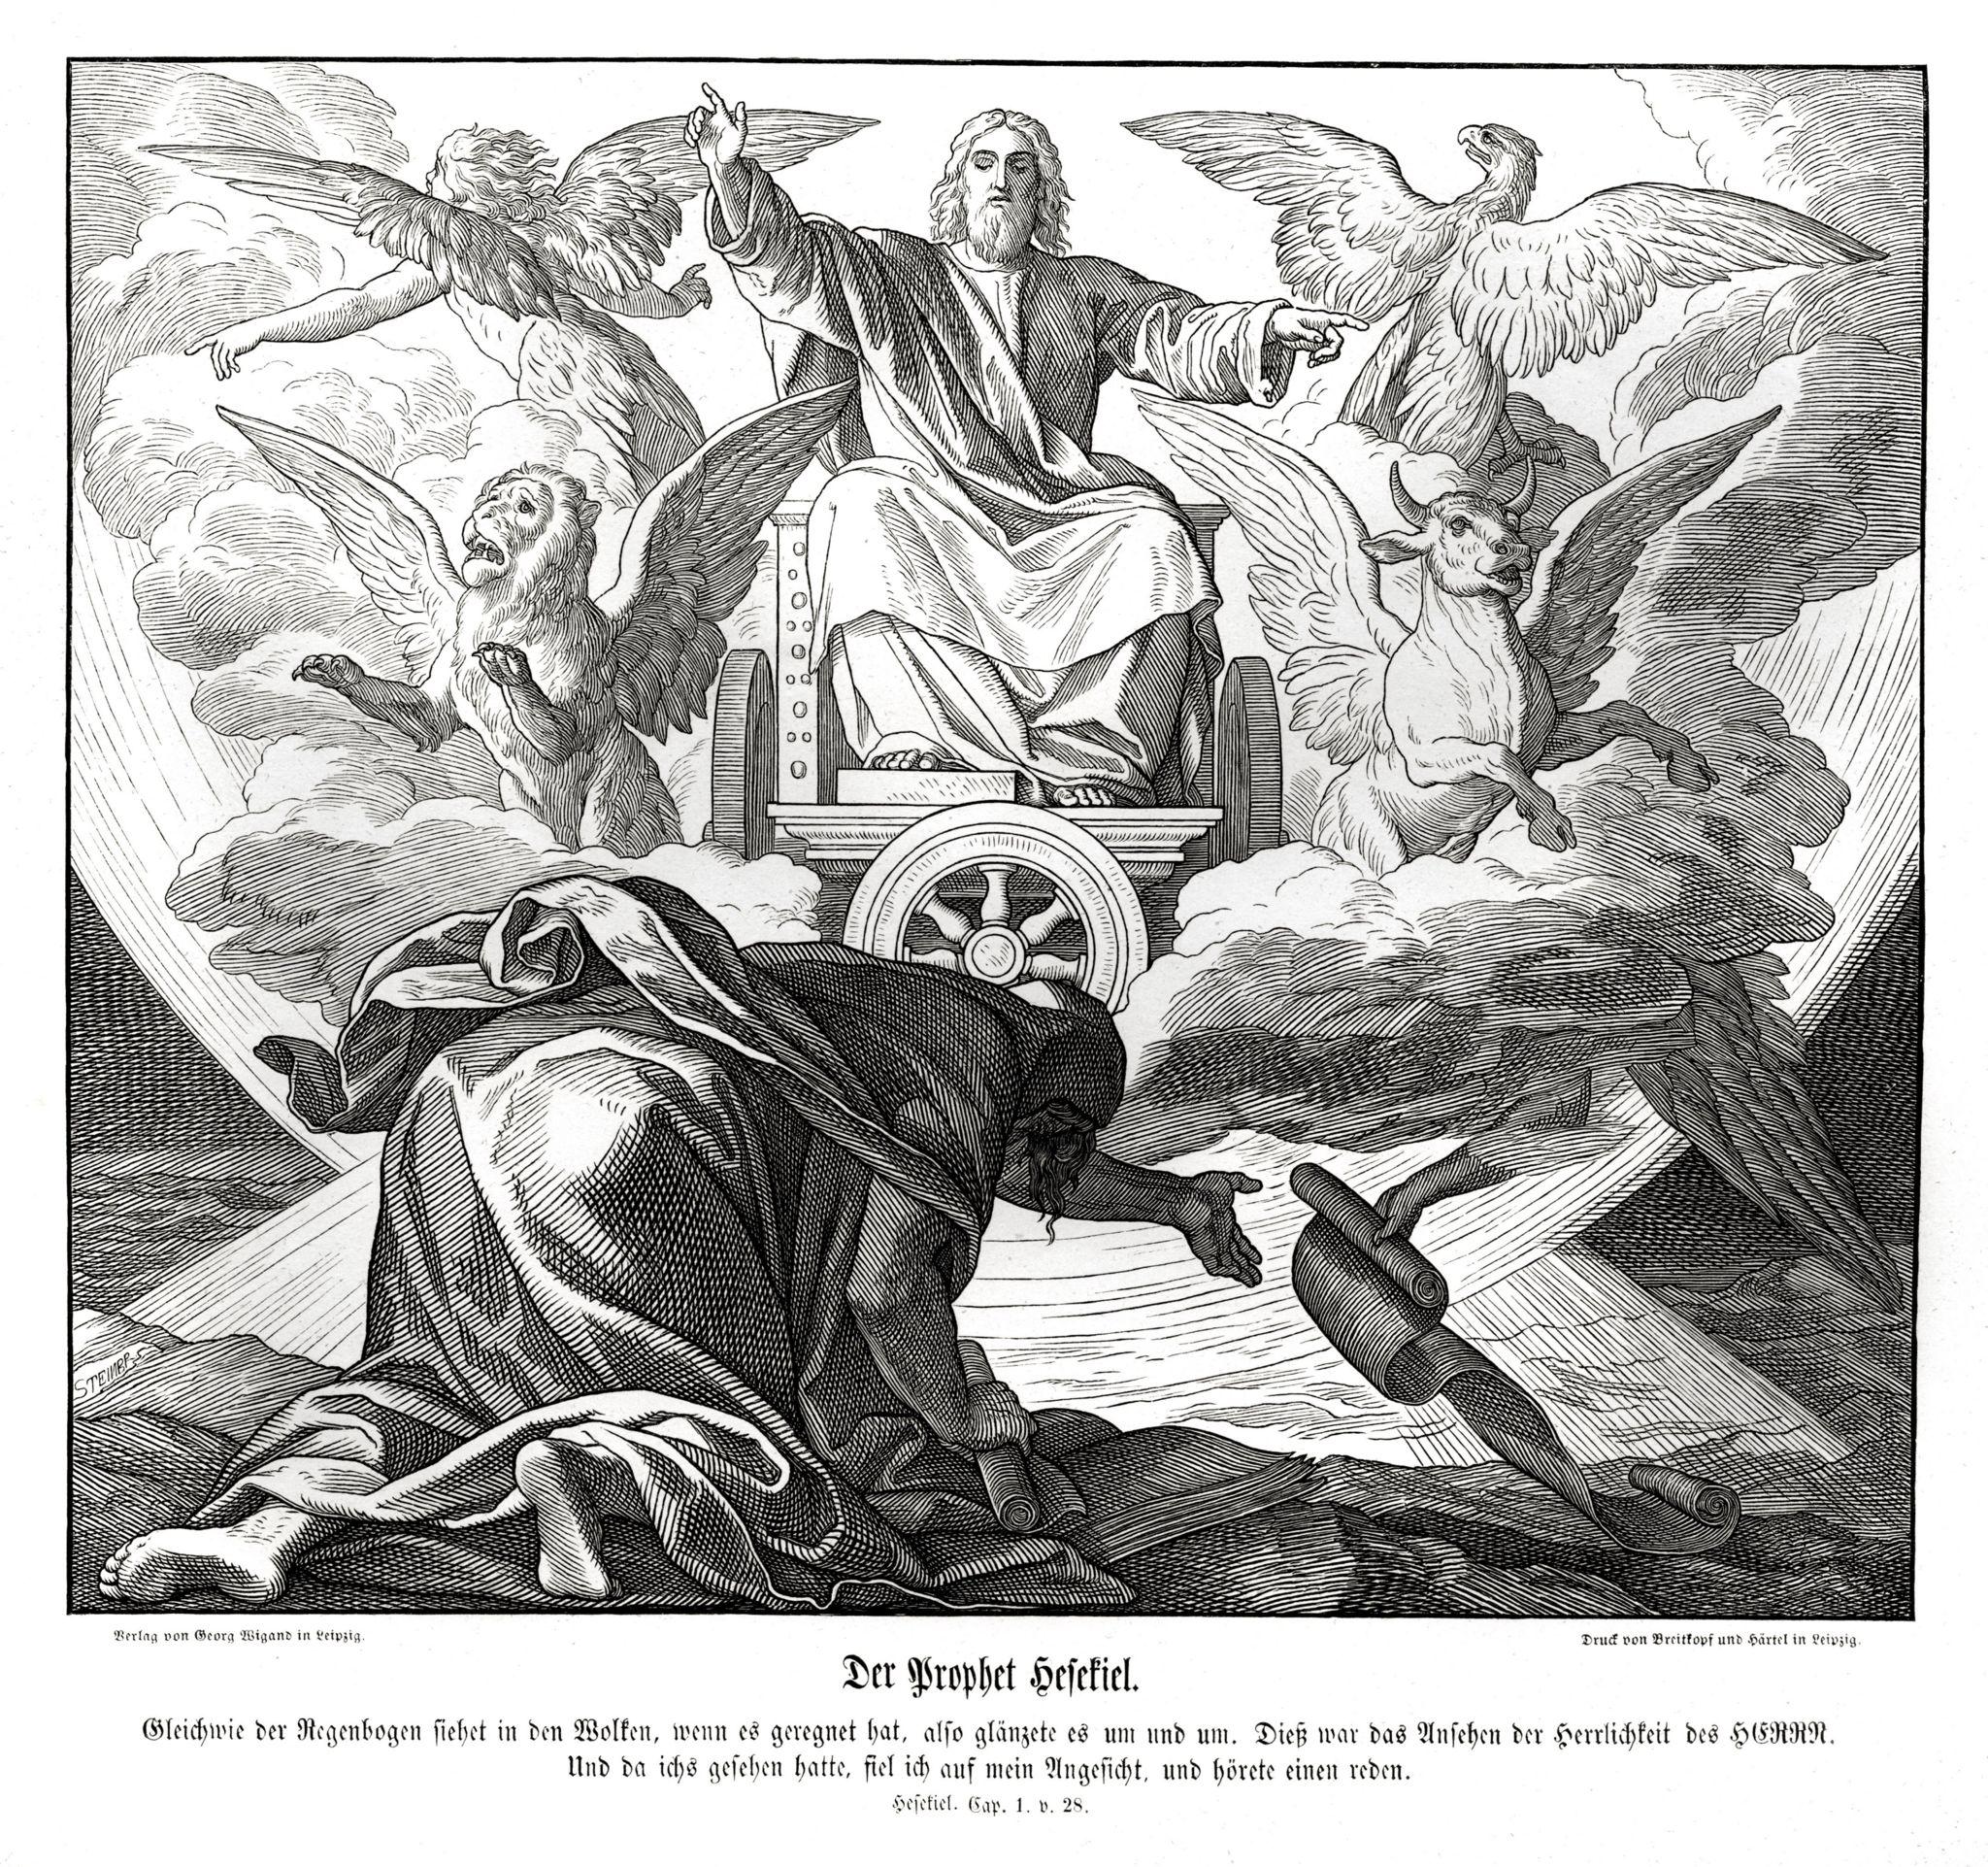 Ezekiel's vision